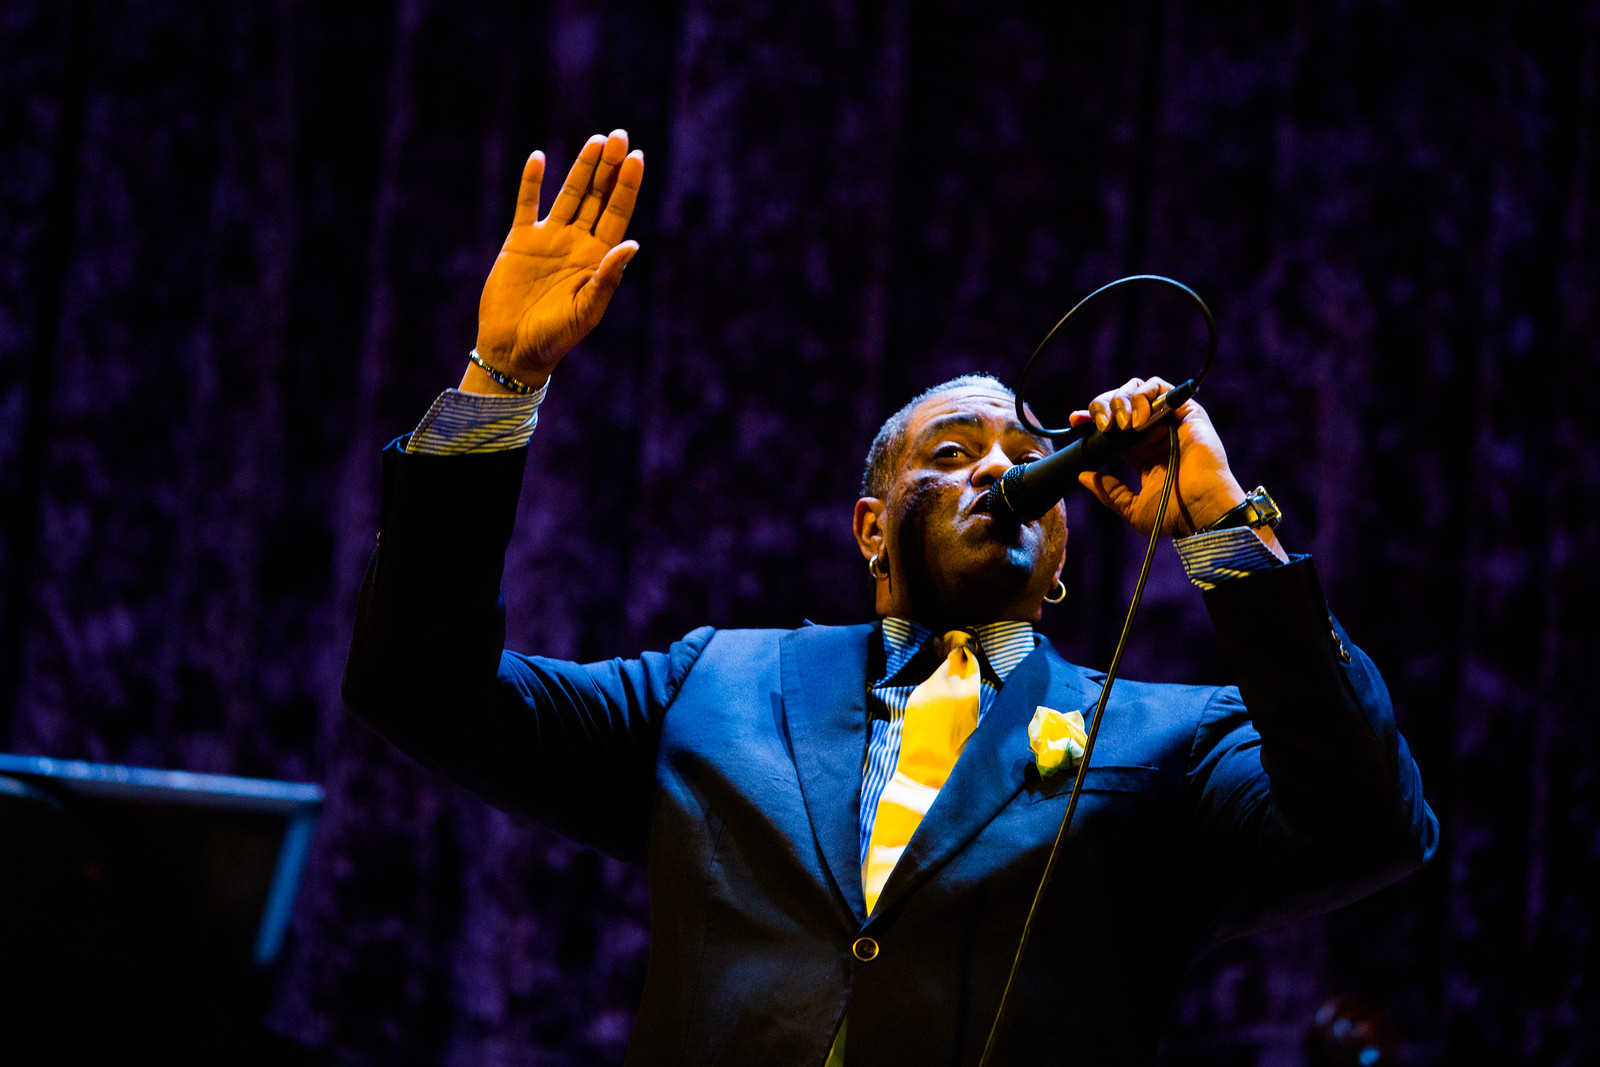 Living-Jazz-MLK-Tribute-2017-Oakland-by-Rosaura-Studios-67-X3.jpg